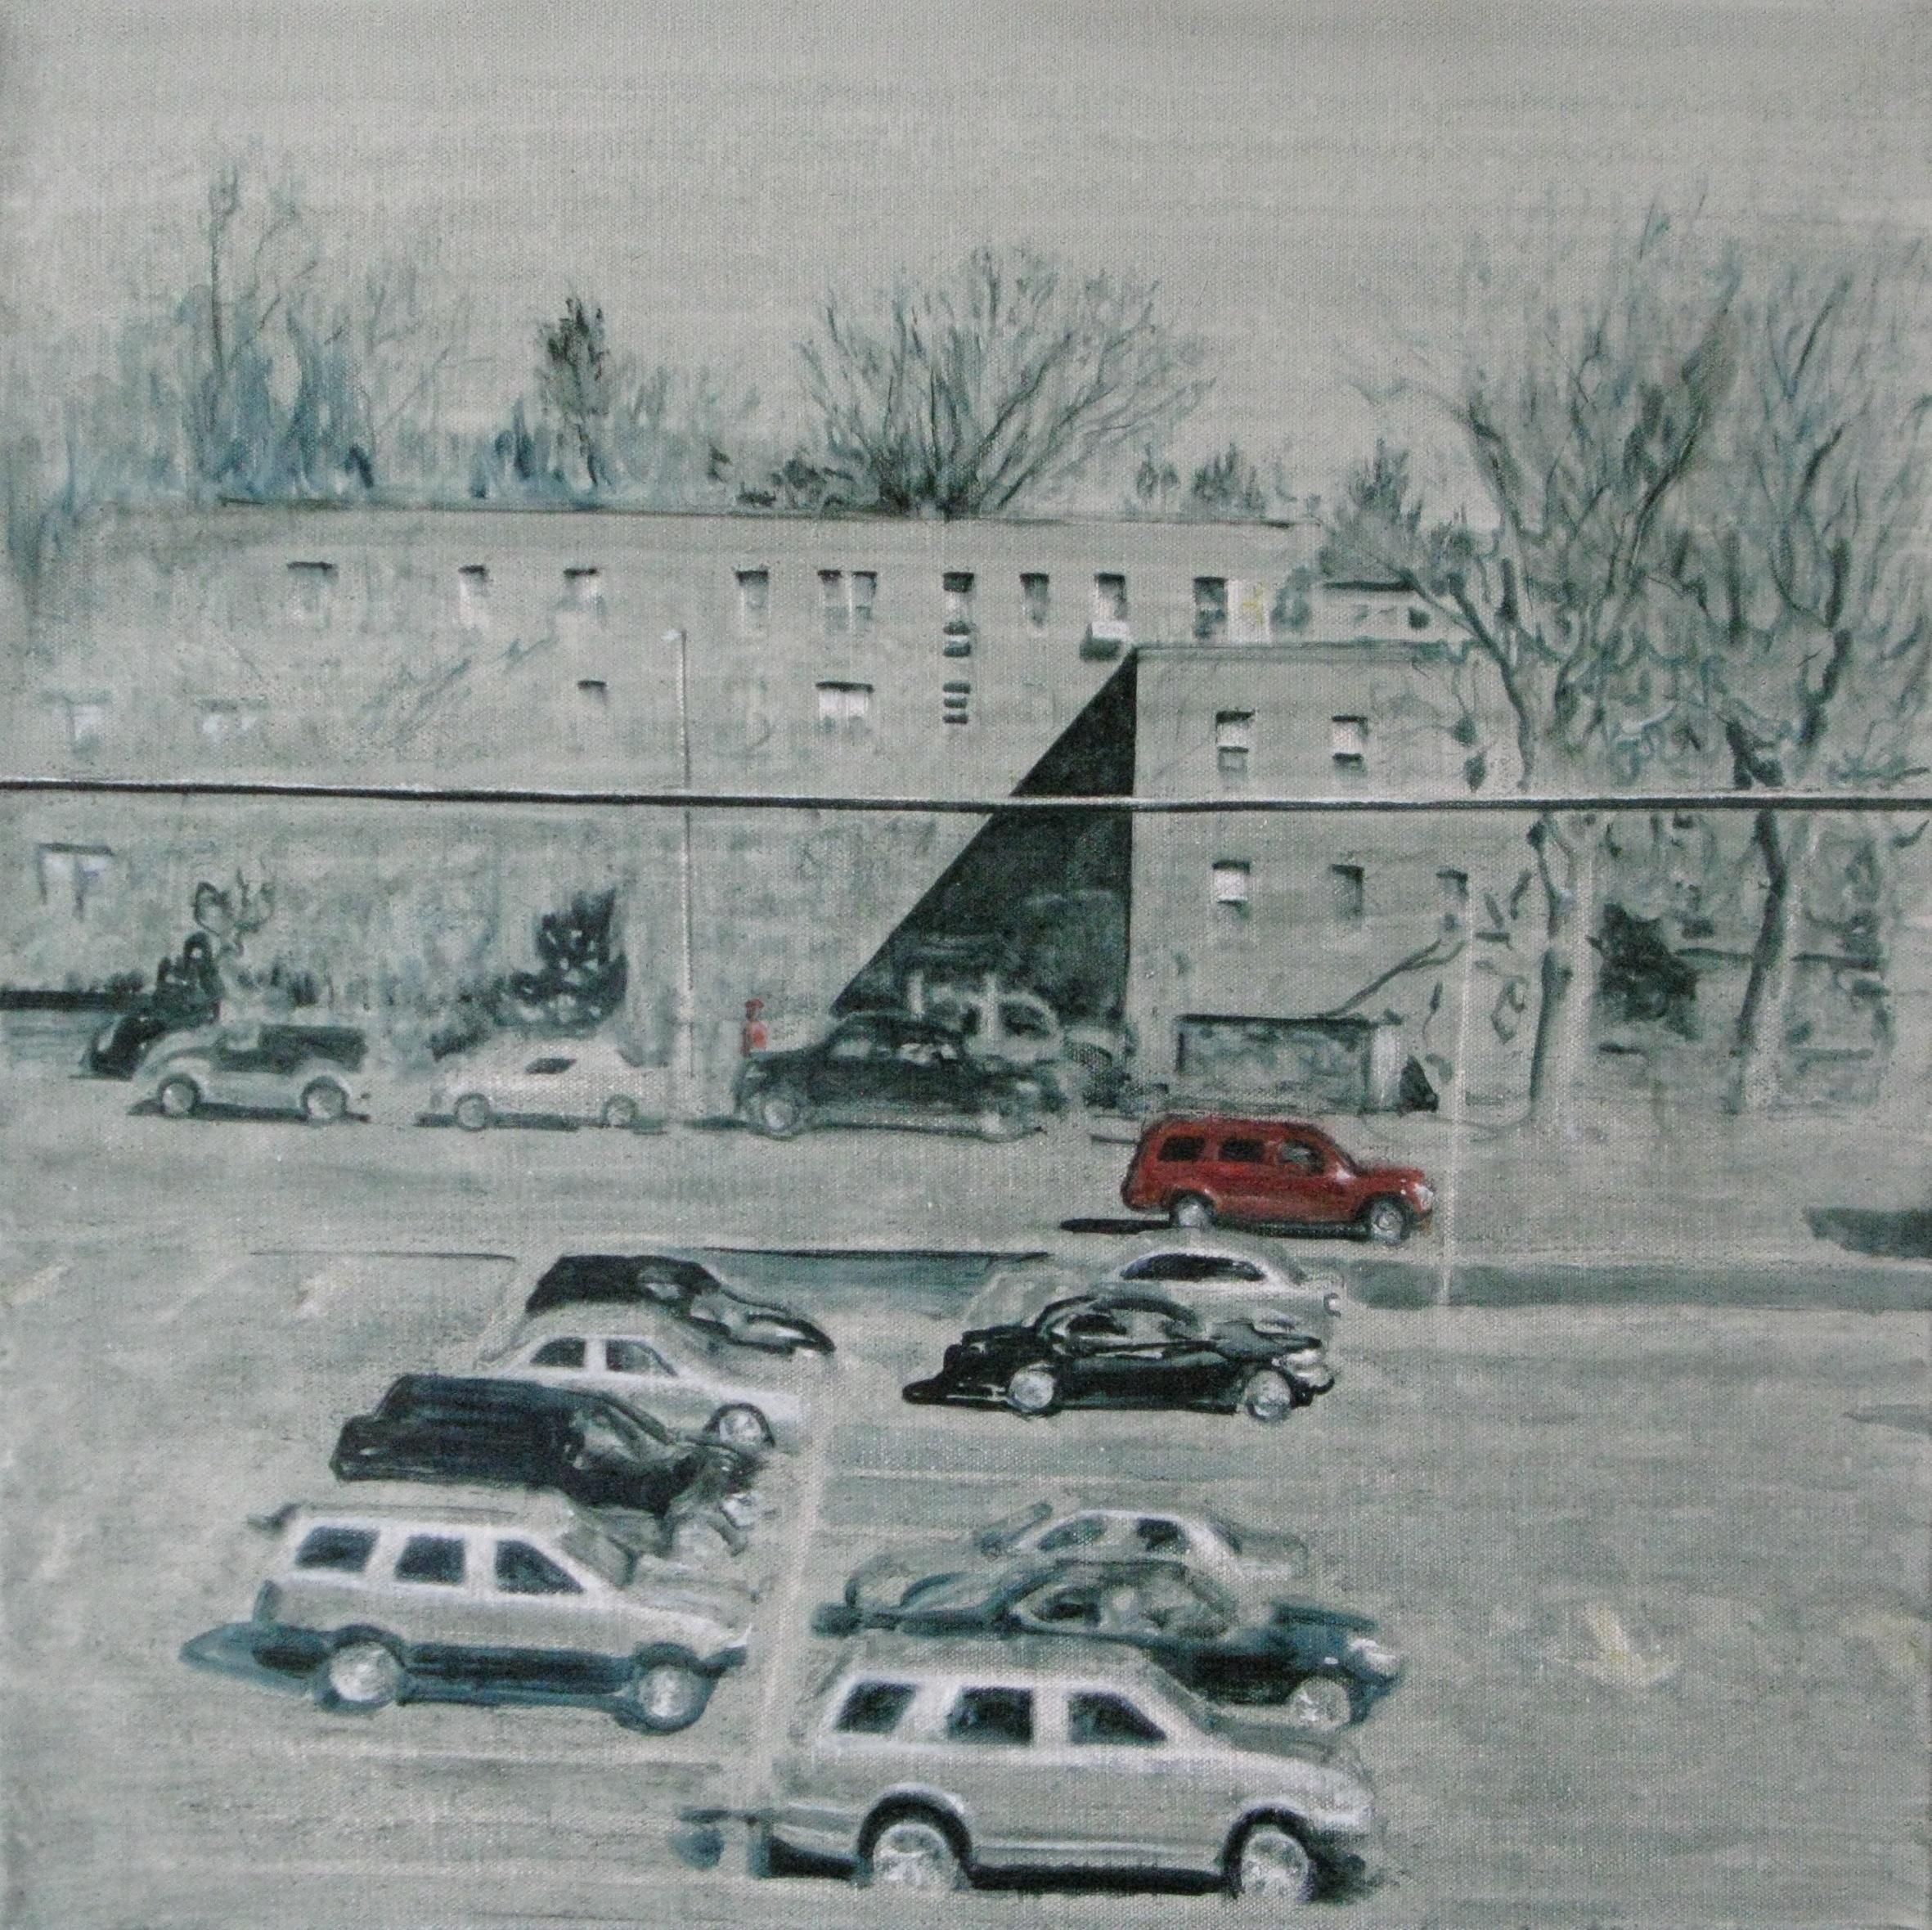 Marguerite Horner 2011. Come on lets go. oil on canvas. 50x50cm.